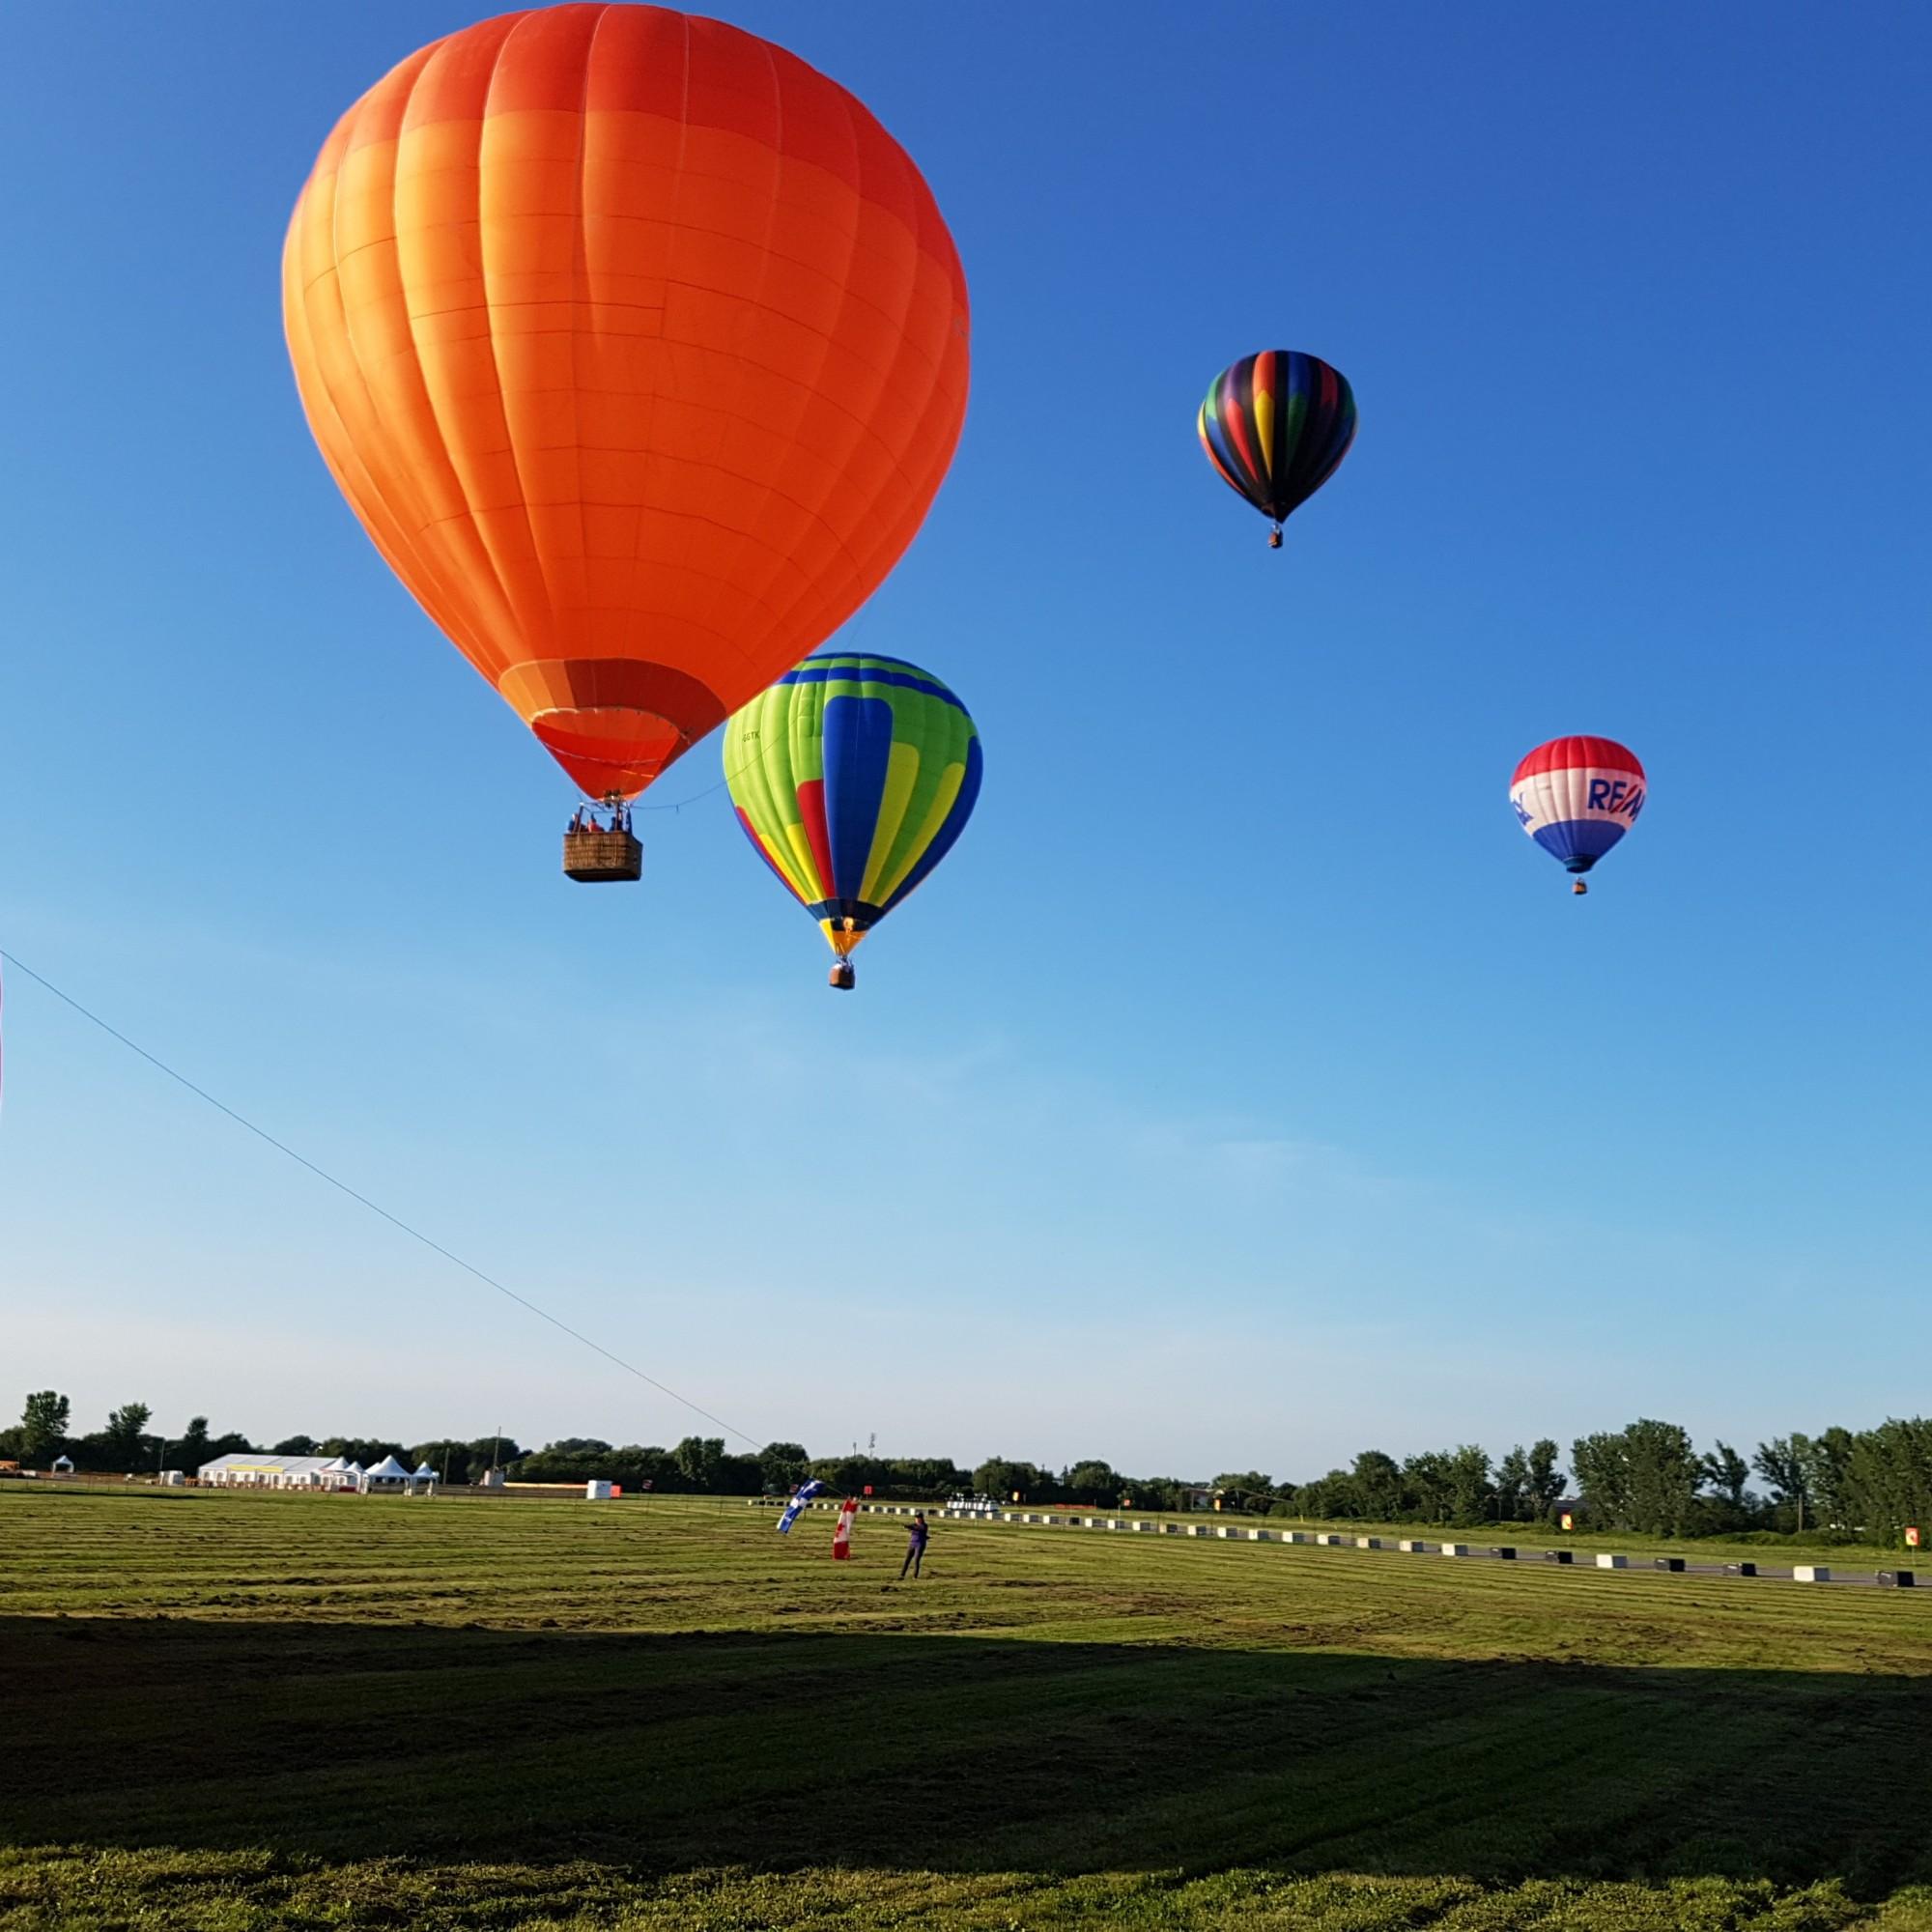 hot air balloon festival montreal 2